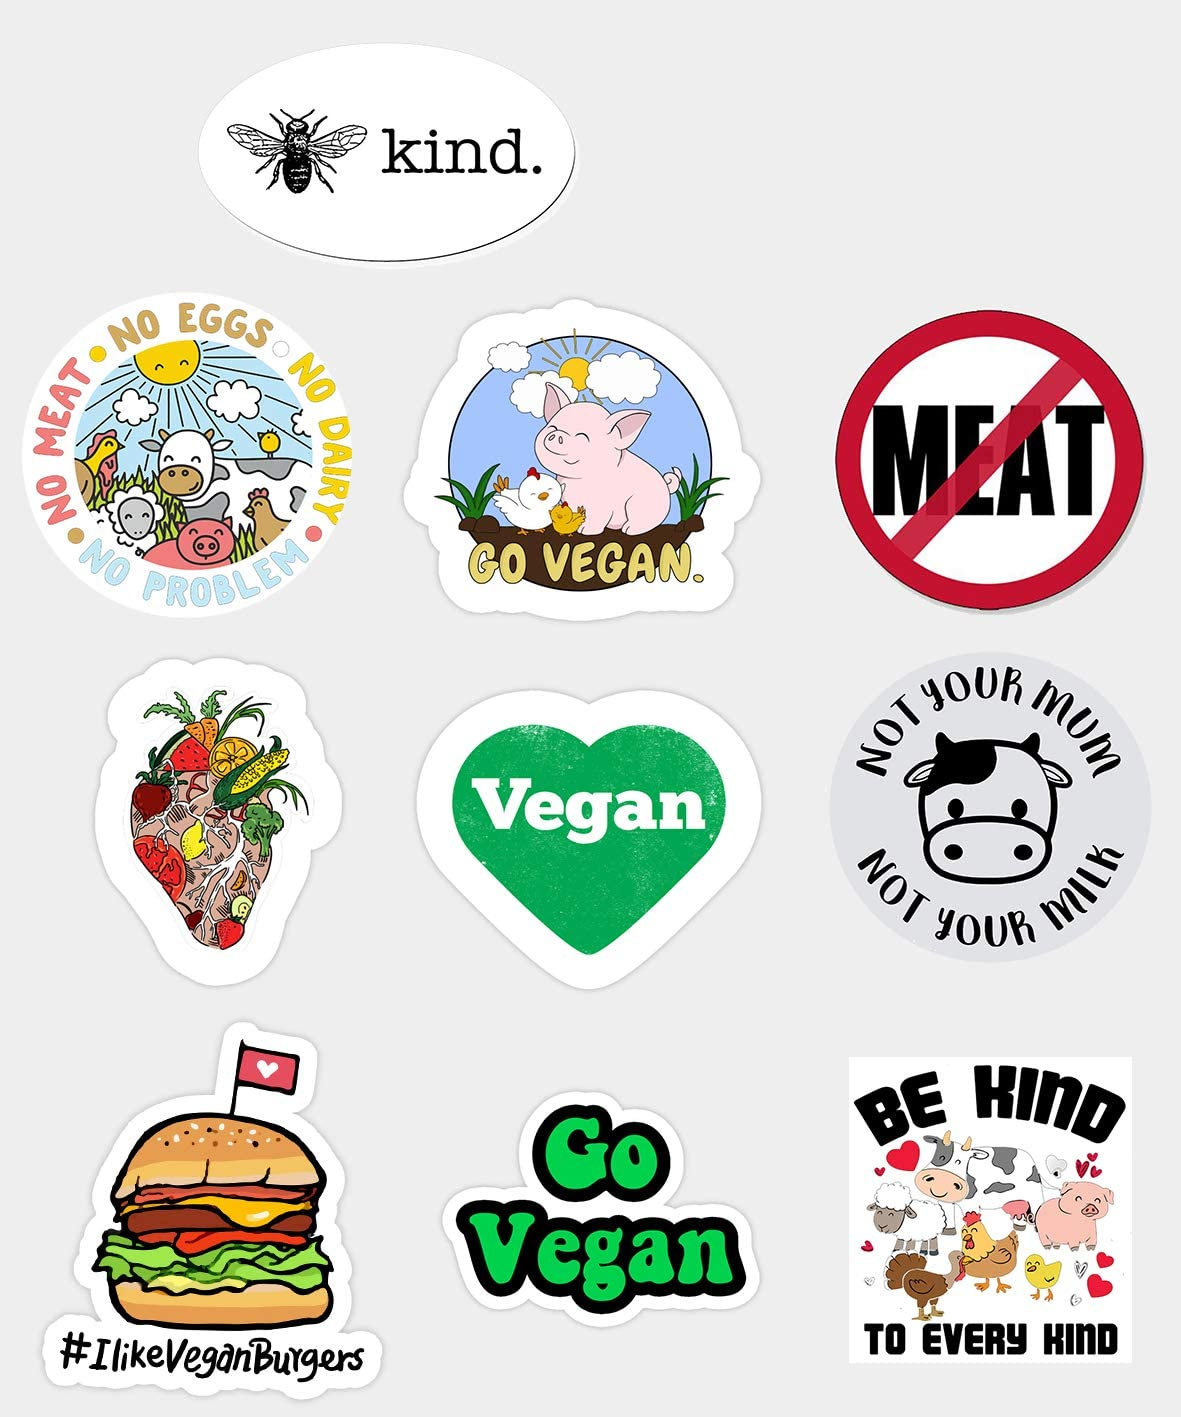 Vinyl Sticker Waterproof Decal 10 Pcs GTOTd Sticker for Go Vegan Be Happy